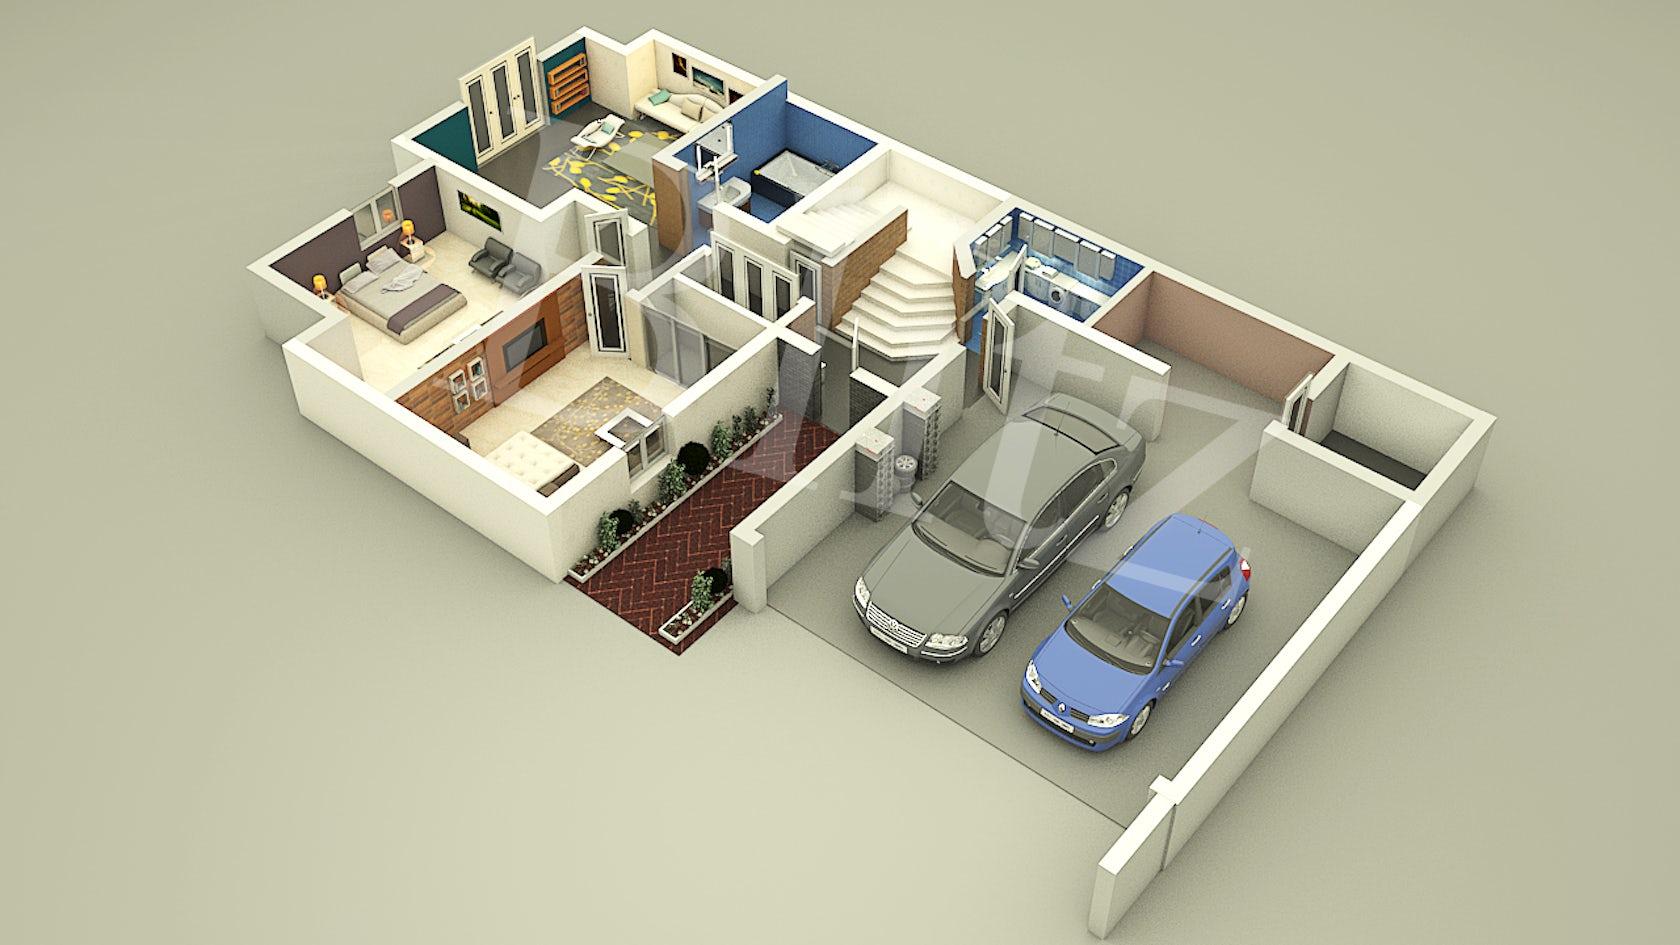 3d animation company architizer - Floor plan 3d house building design ...